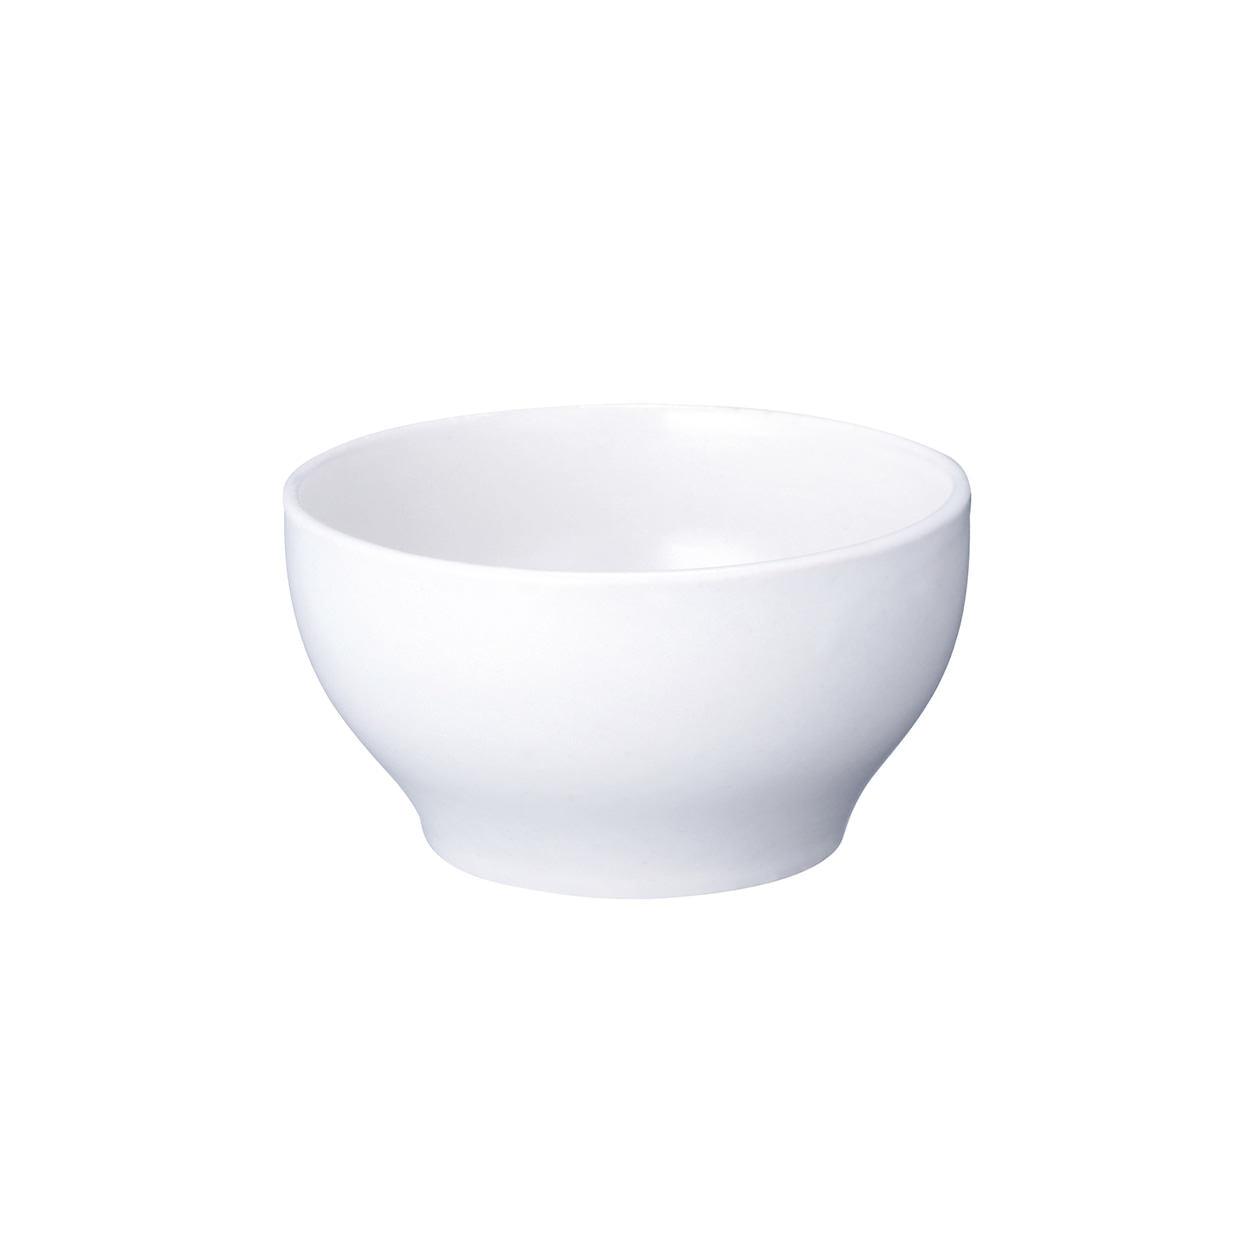 RoomClip商品情報 - こども食器・磁器碗・中